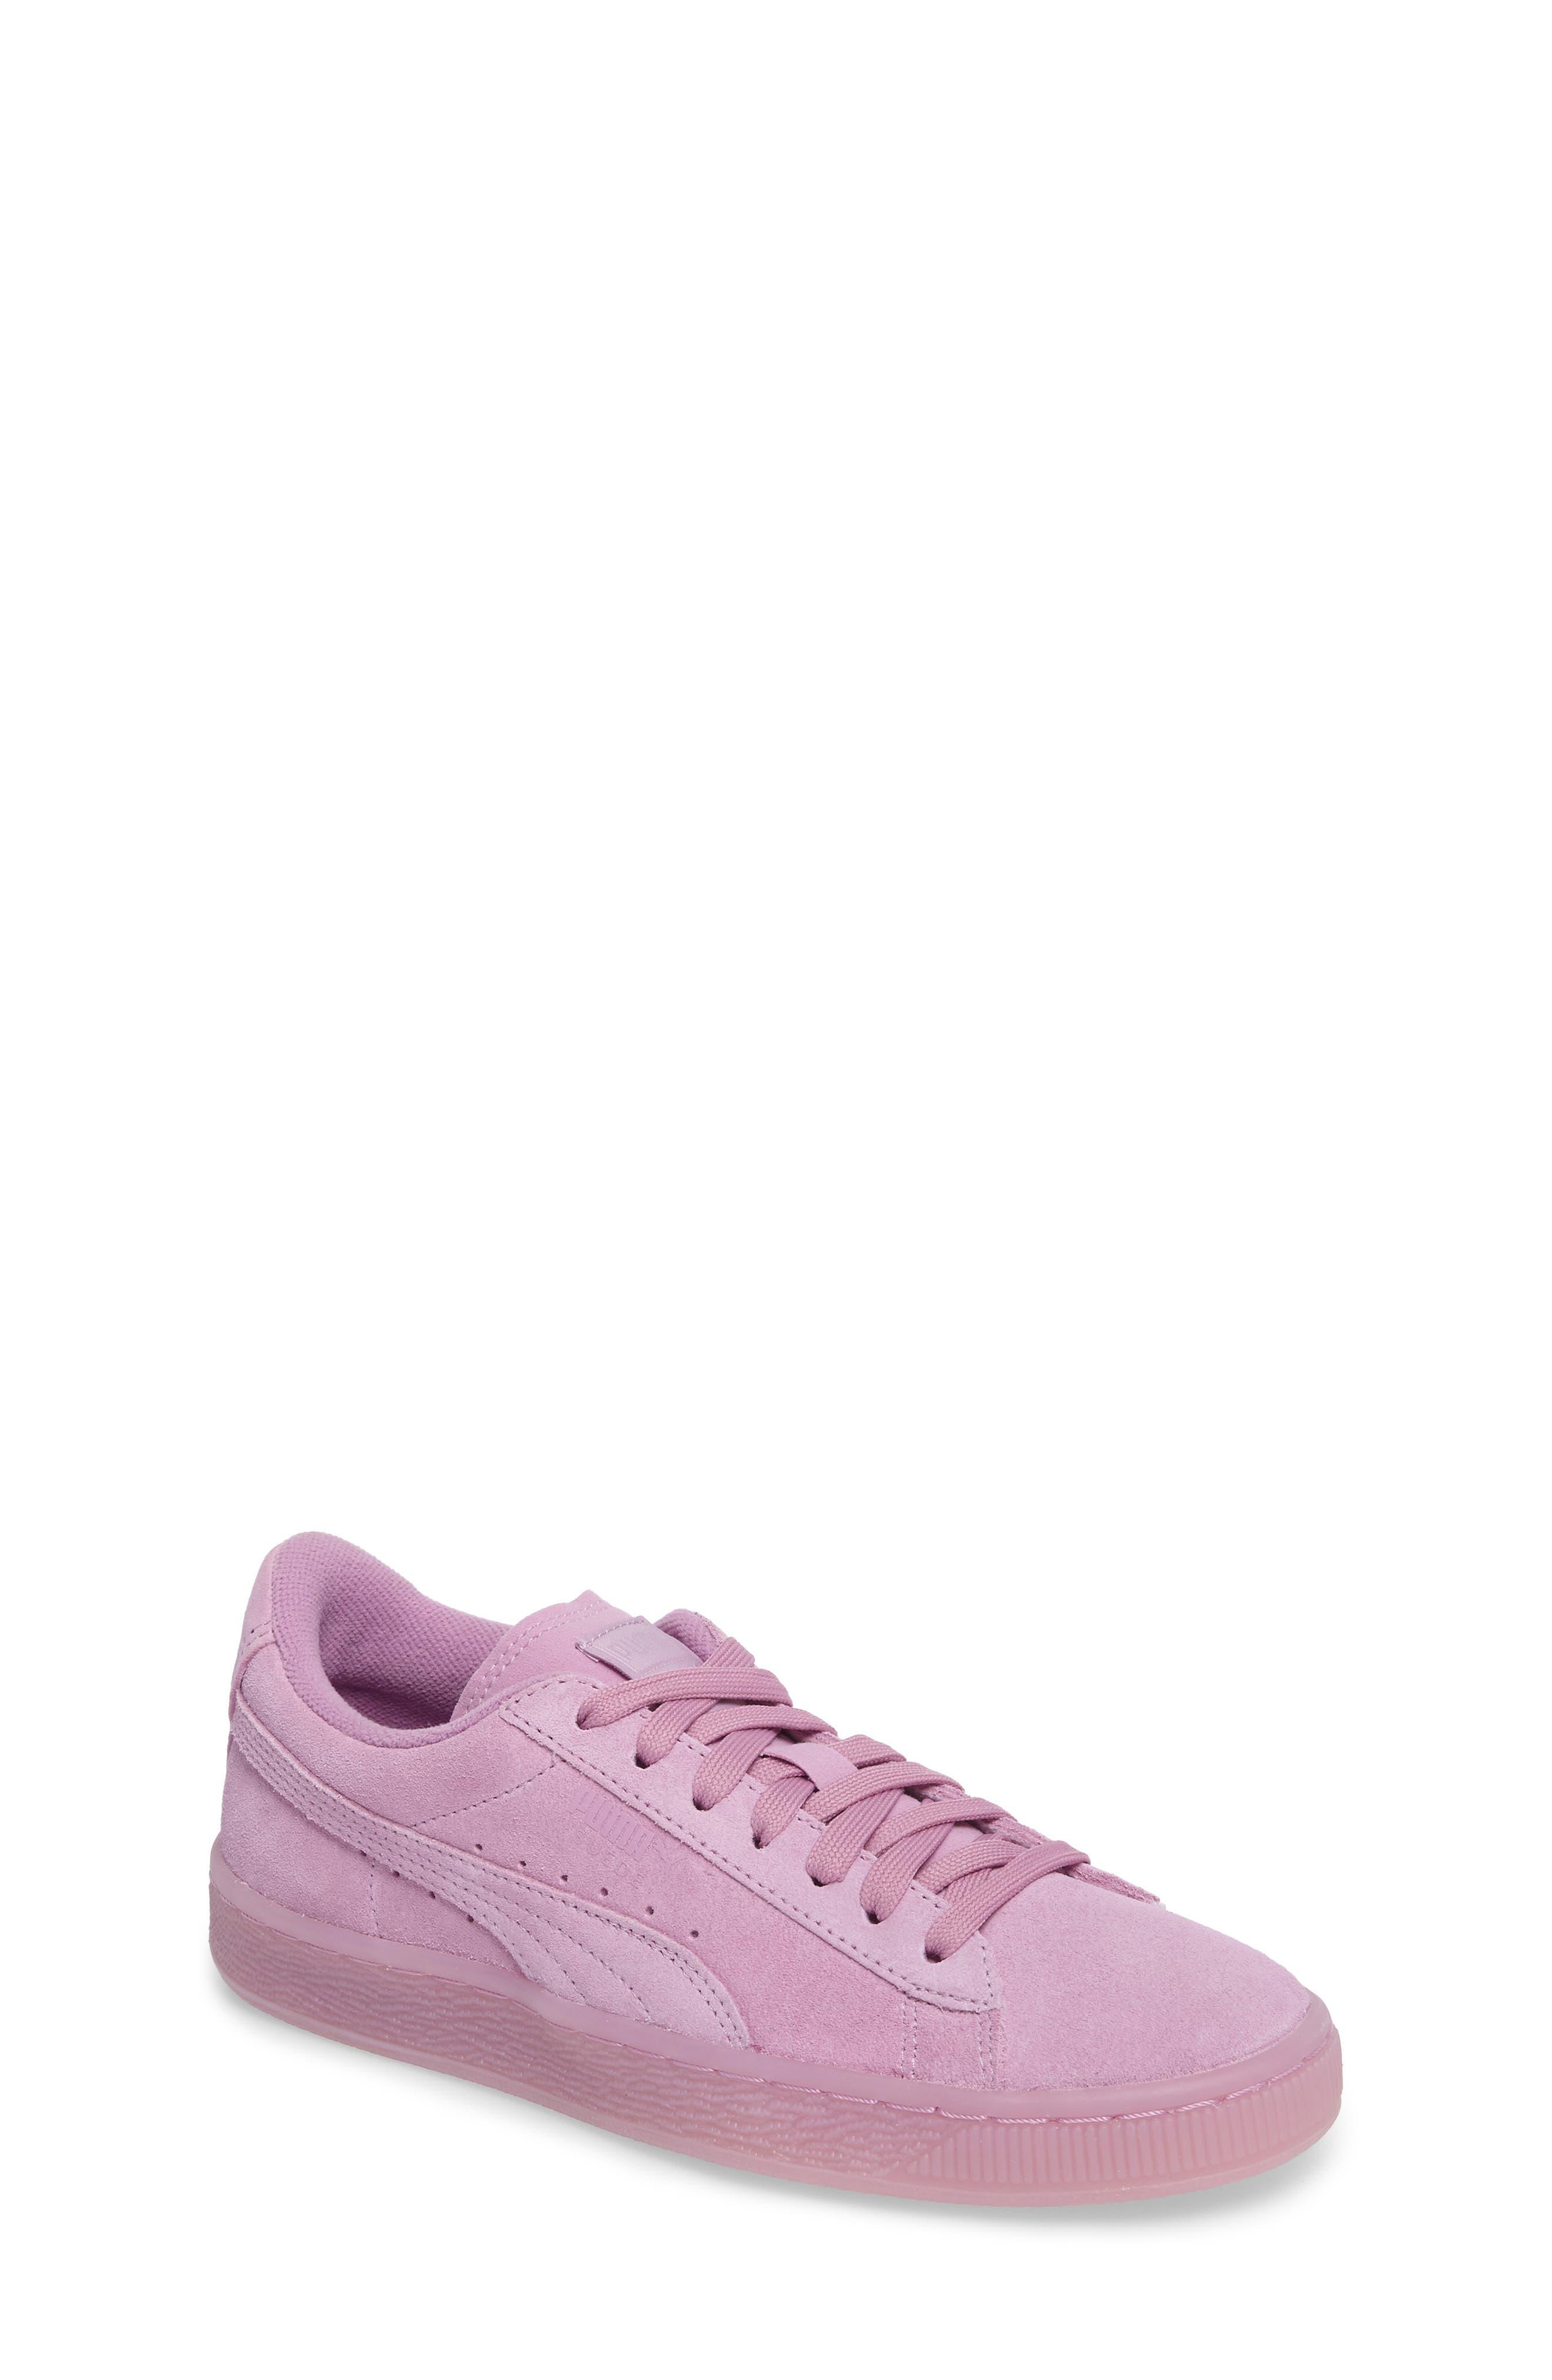 PUMA Iced Suede Sneaker